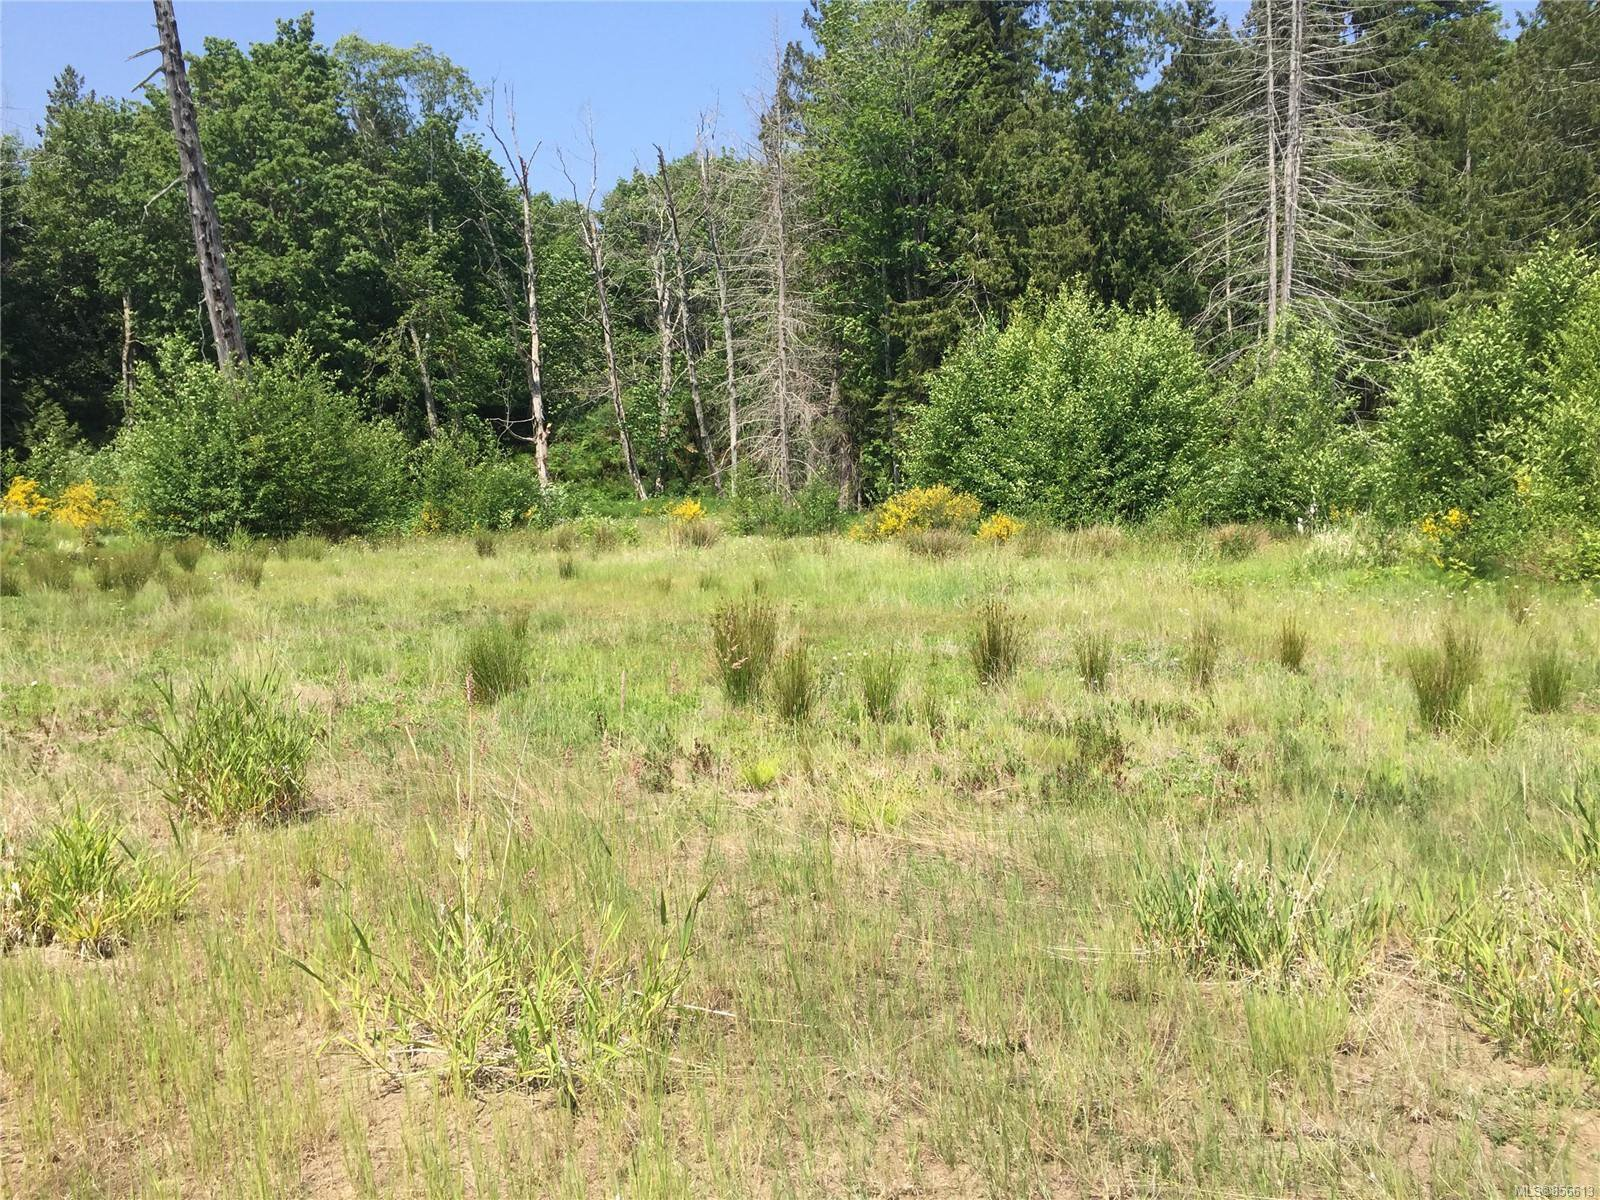 Main Photo: 3030 Northwest Bay Rd in : PQ Nanoose Land for sale (Parksville/Qualicum)  : MLS®# 856613